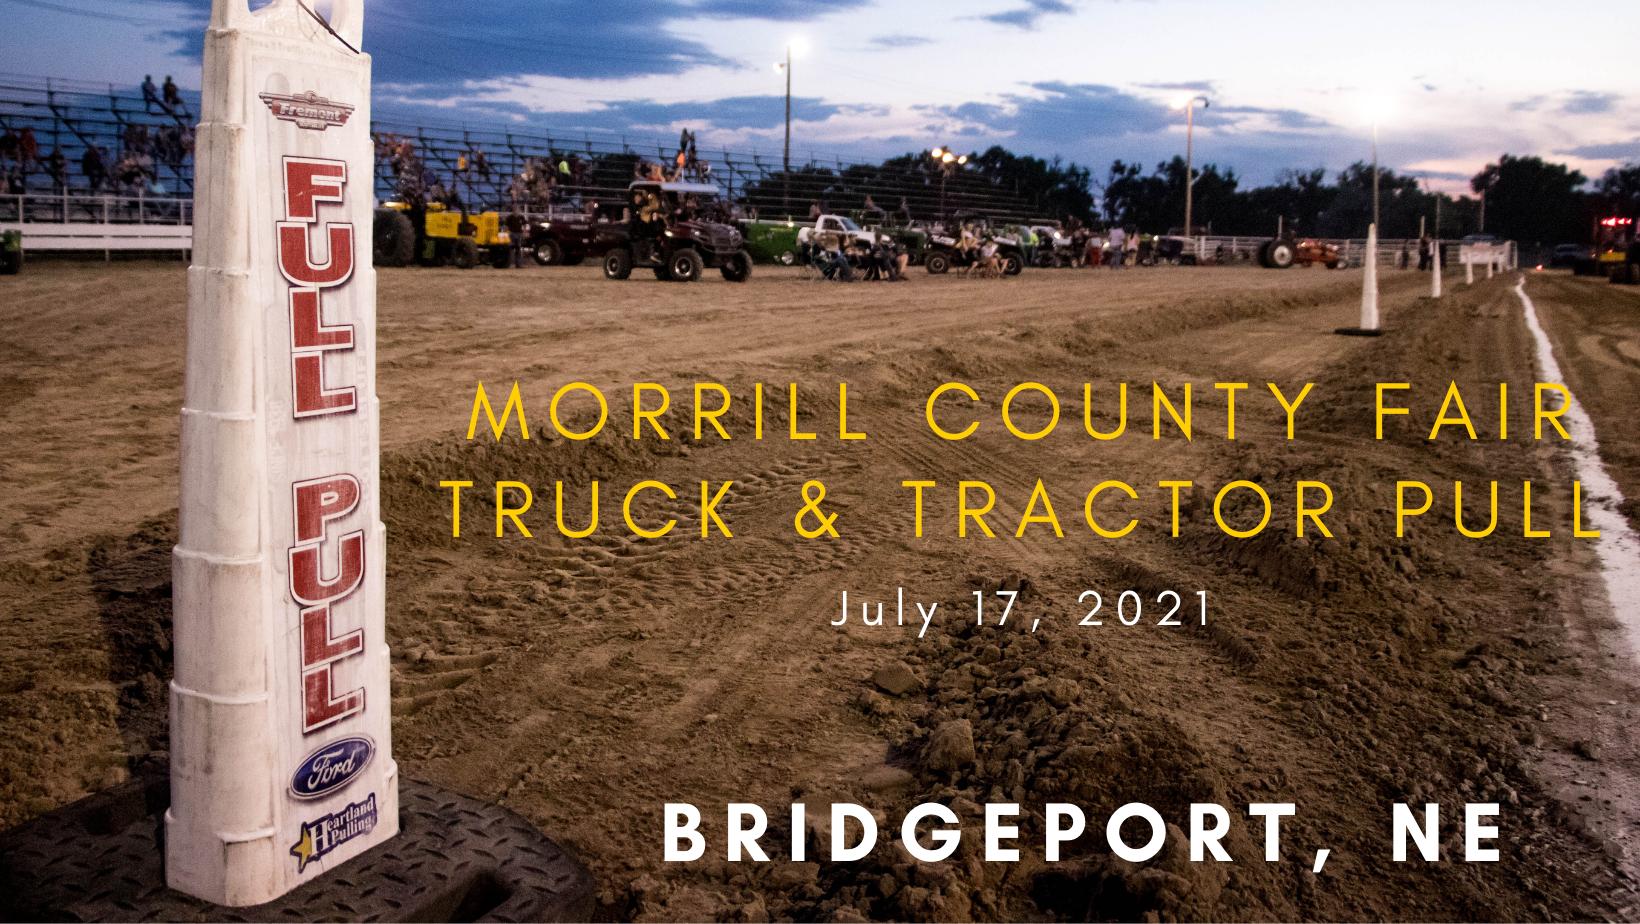 Morrill County Fair Truck & Tractor Pull